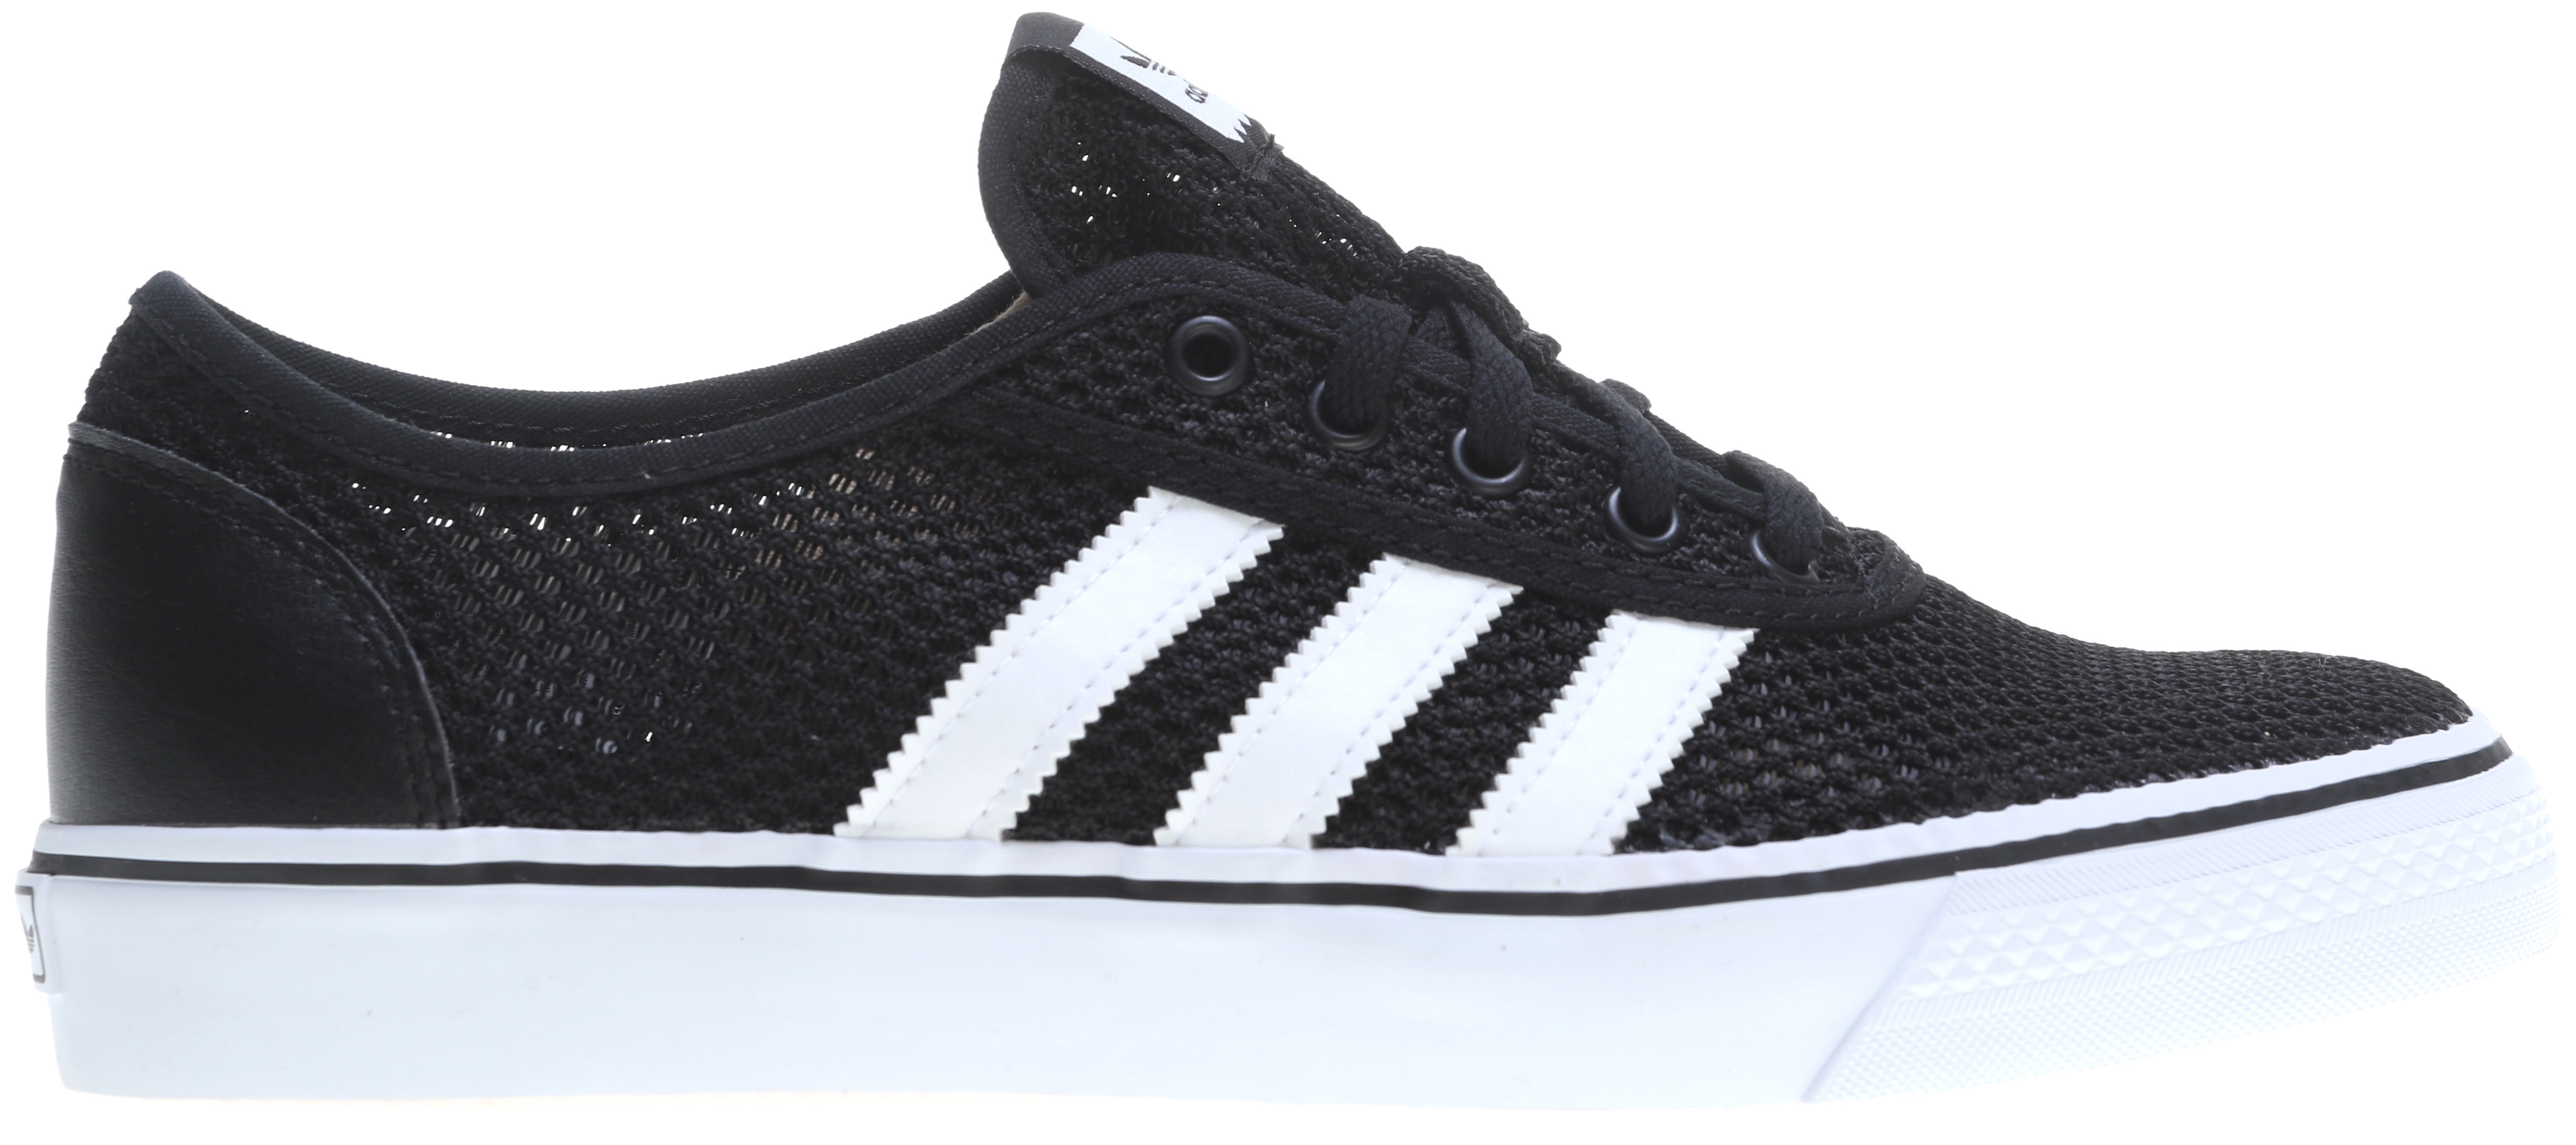 new style 9f0c4 a4ae6 Adidas Adi-Ease Clima Skate Shoes - thumbnail 1